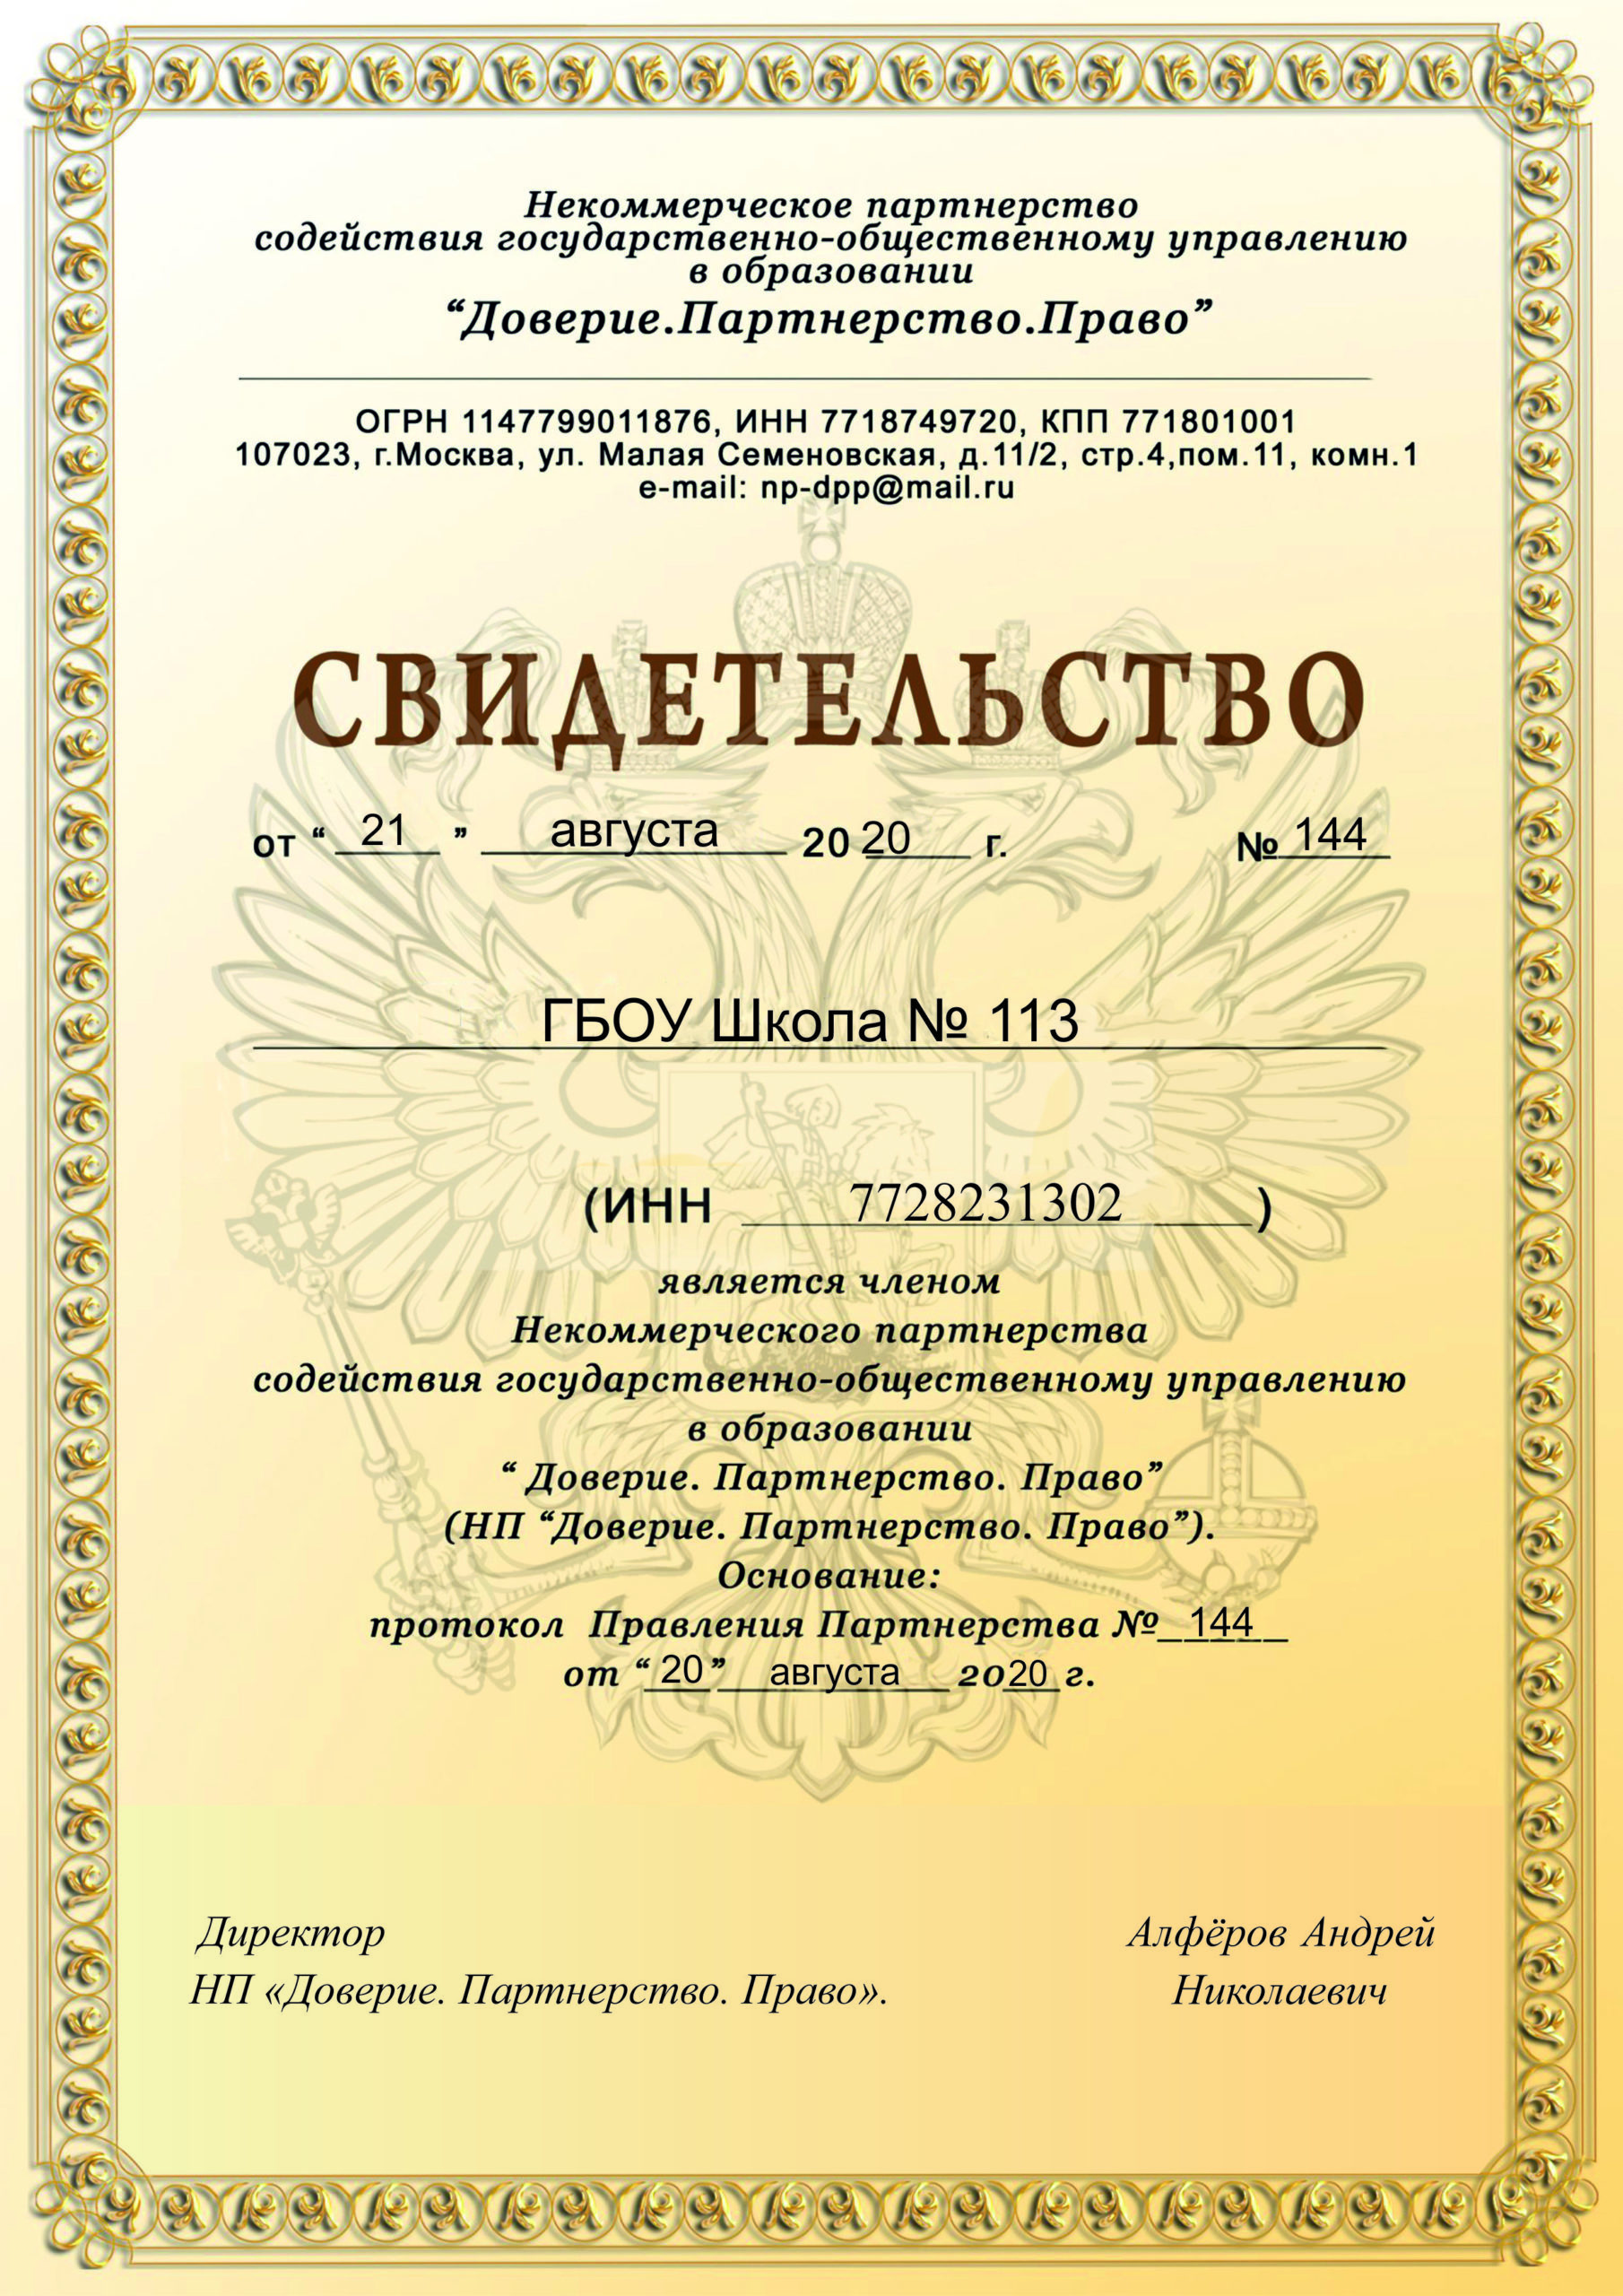 С-во Члена Партнерства школа 113